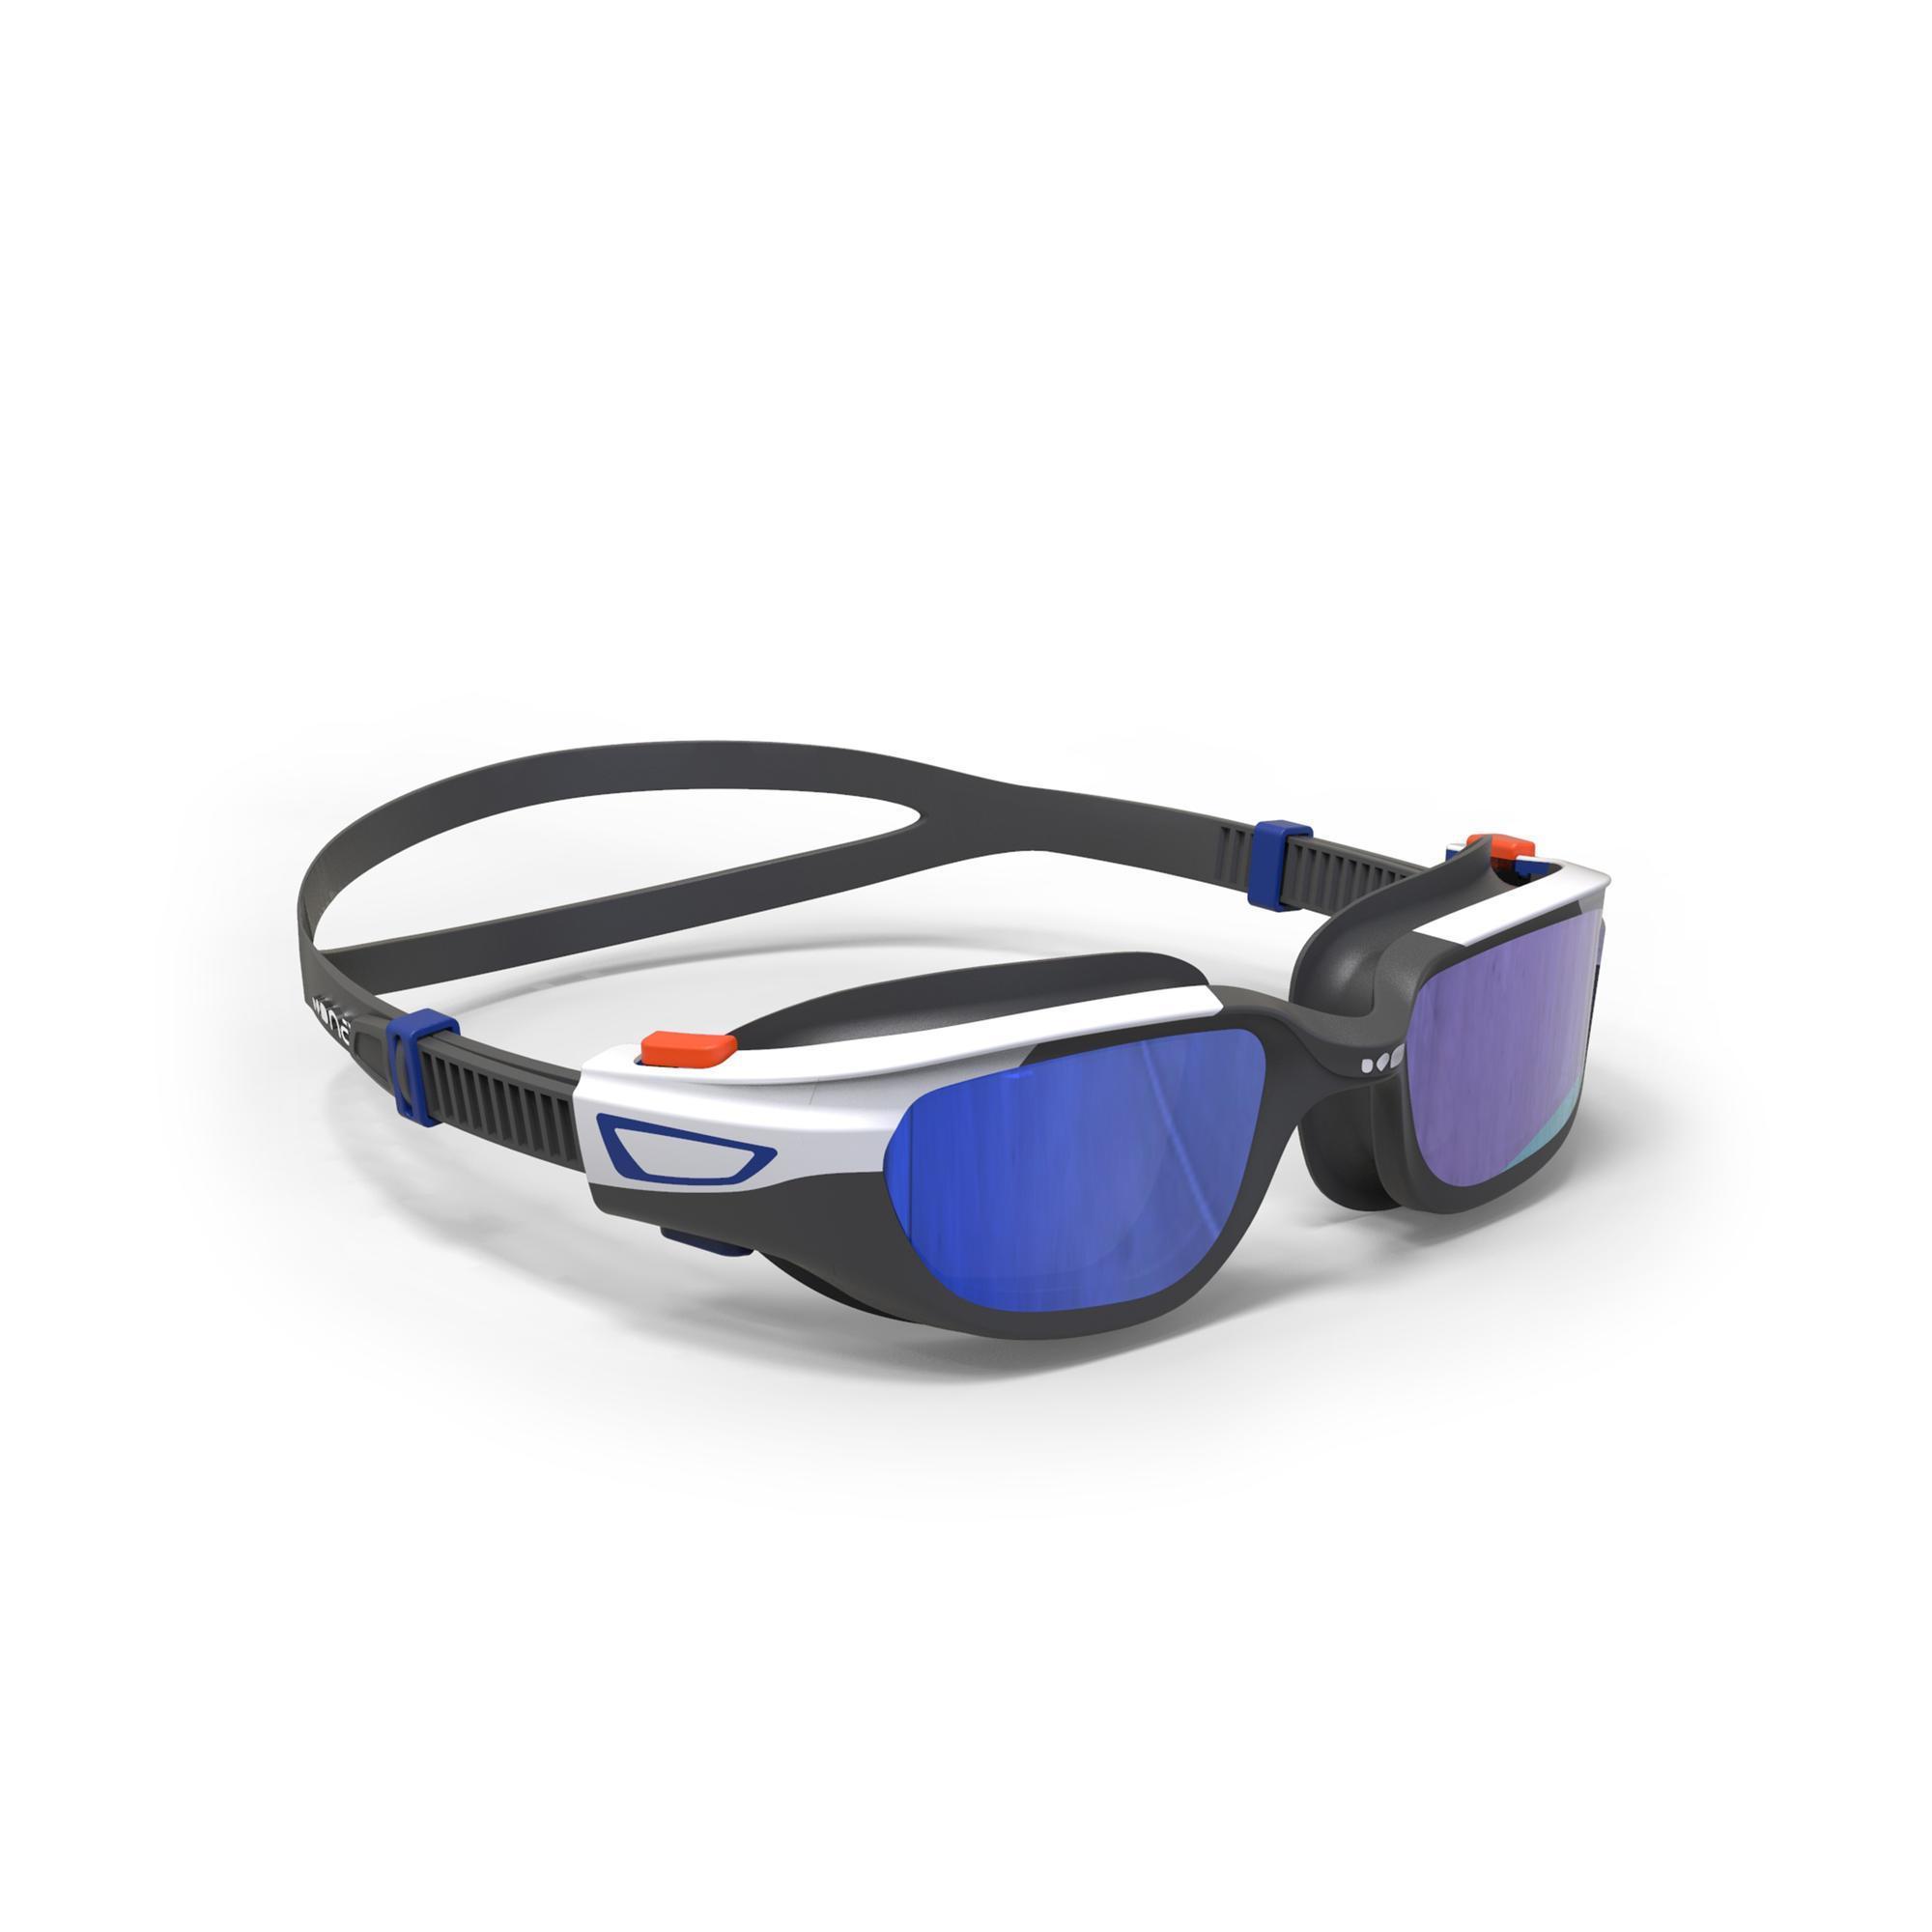 424a3c62871 Gafas Natación Piscina Nabaiji 500 Spirit Adulto Azul Cristales Espejo Antivaho  Nabaiji | Decathlon